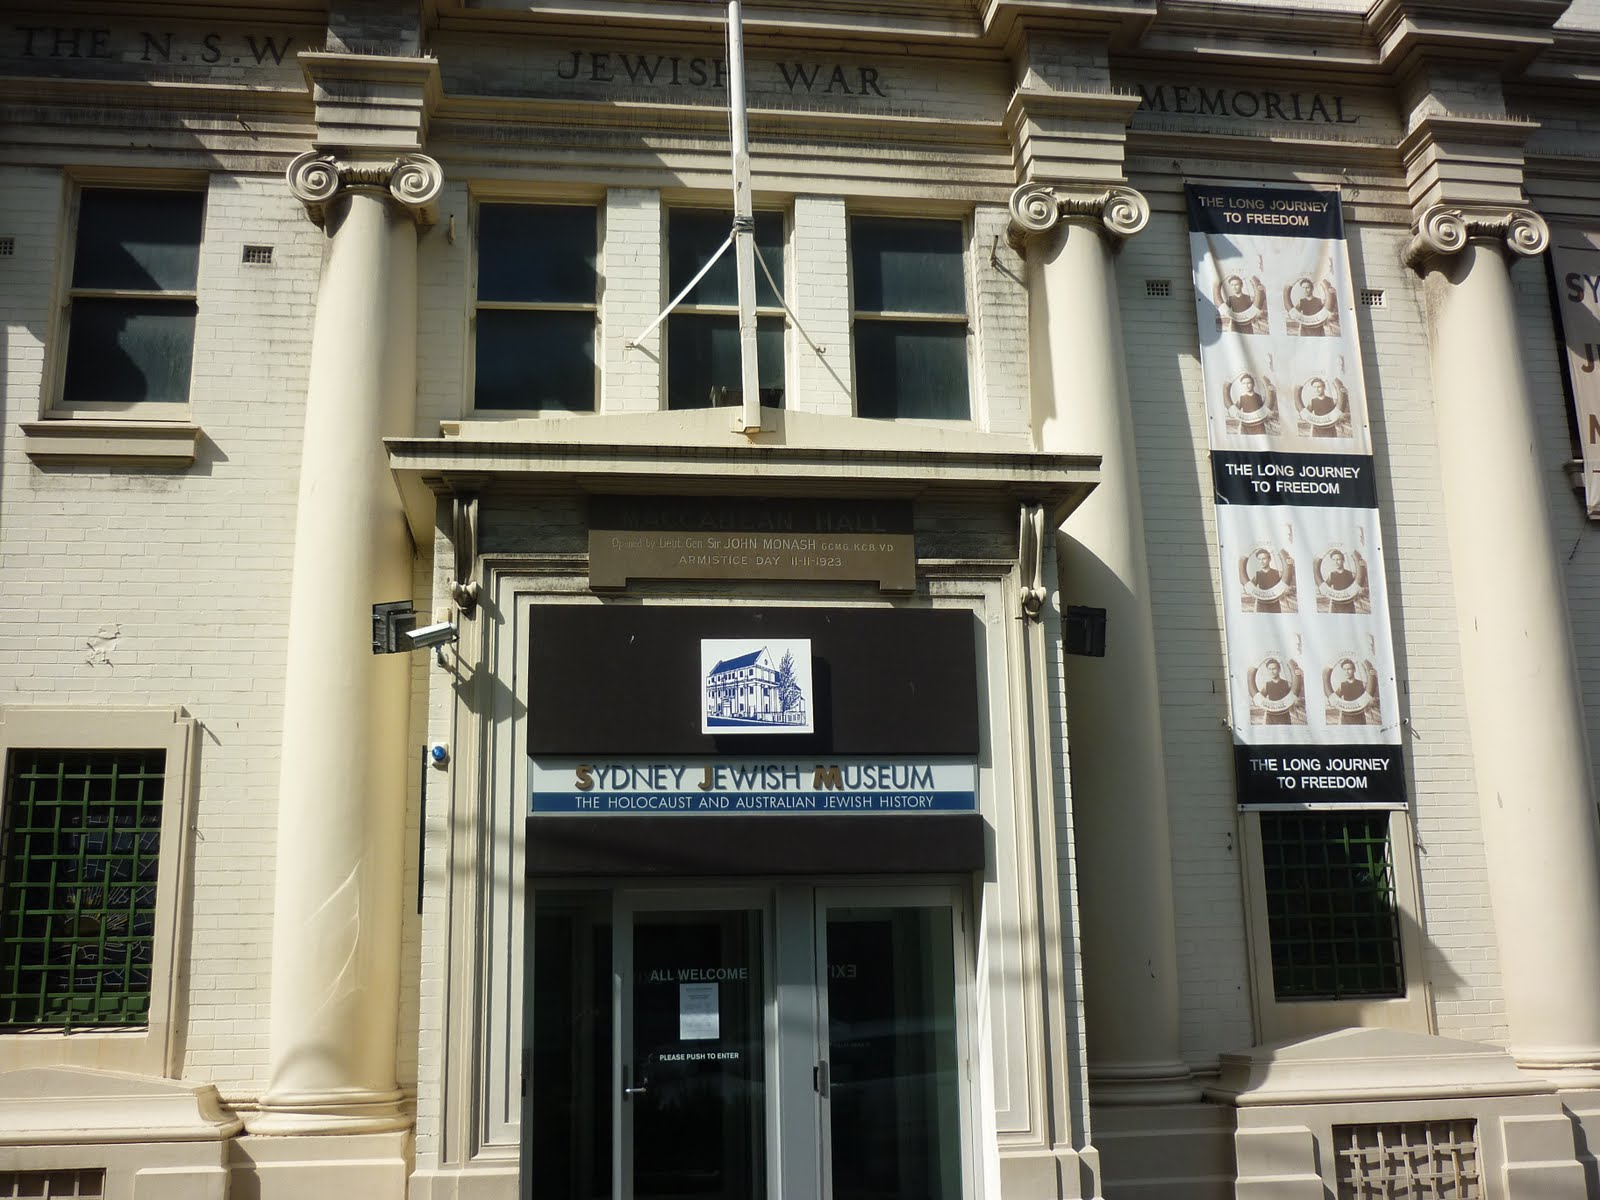 sydney jewish museum contact - photo#18